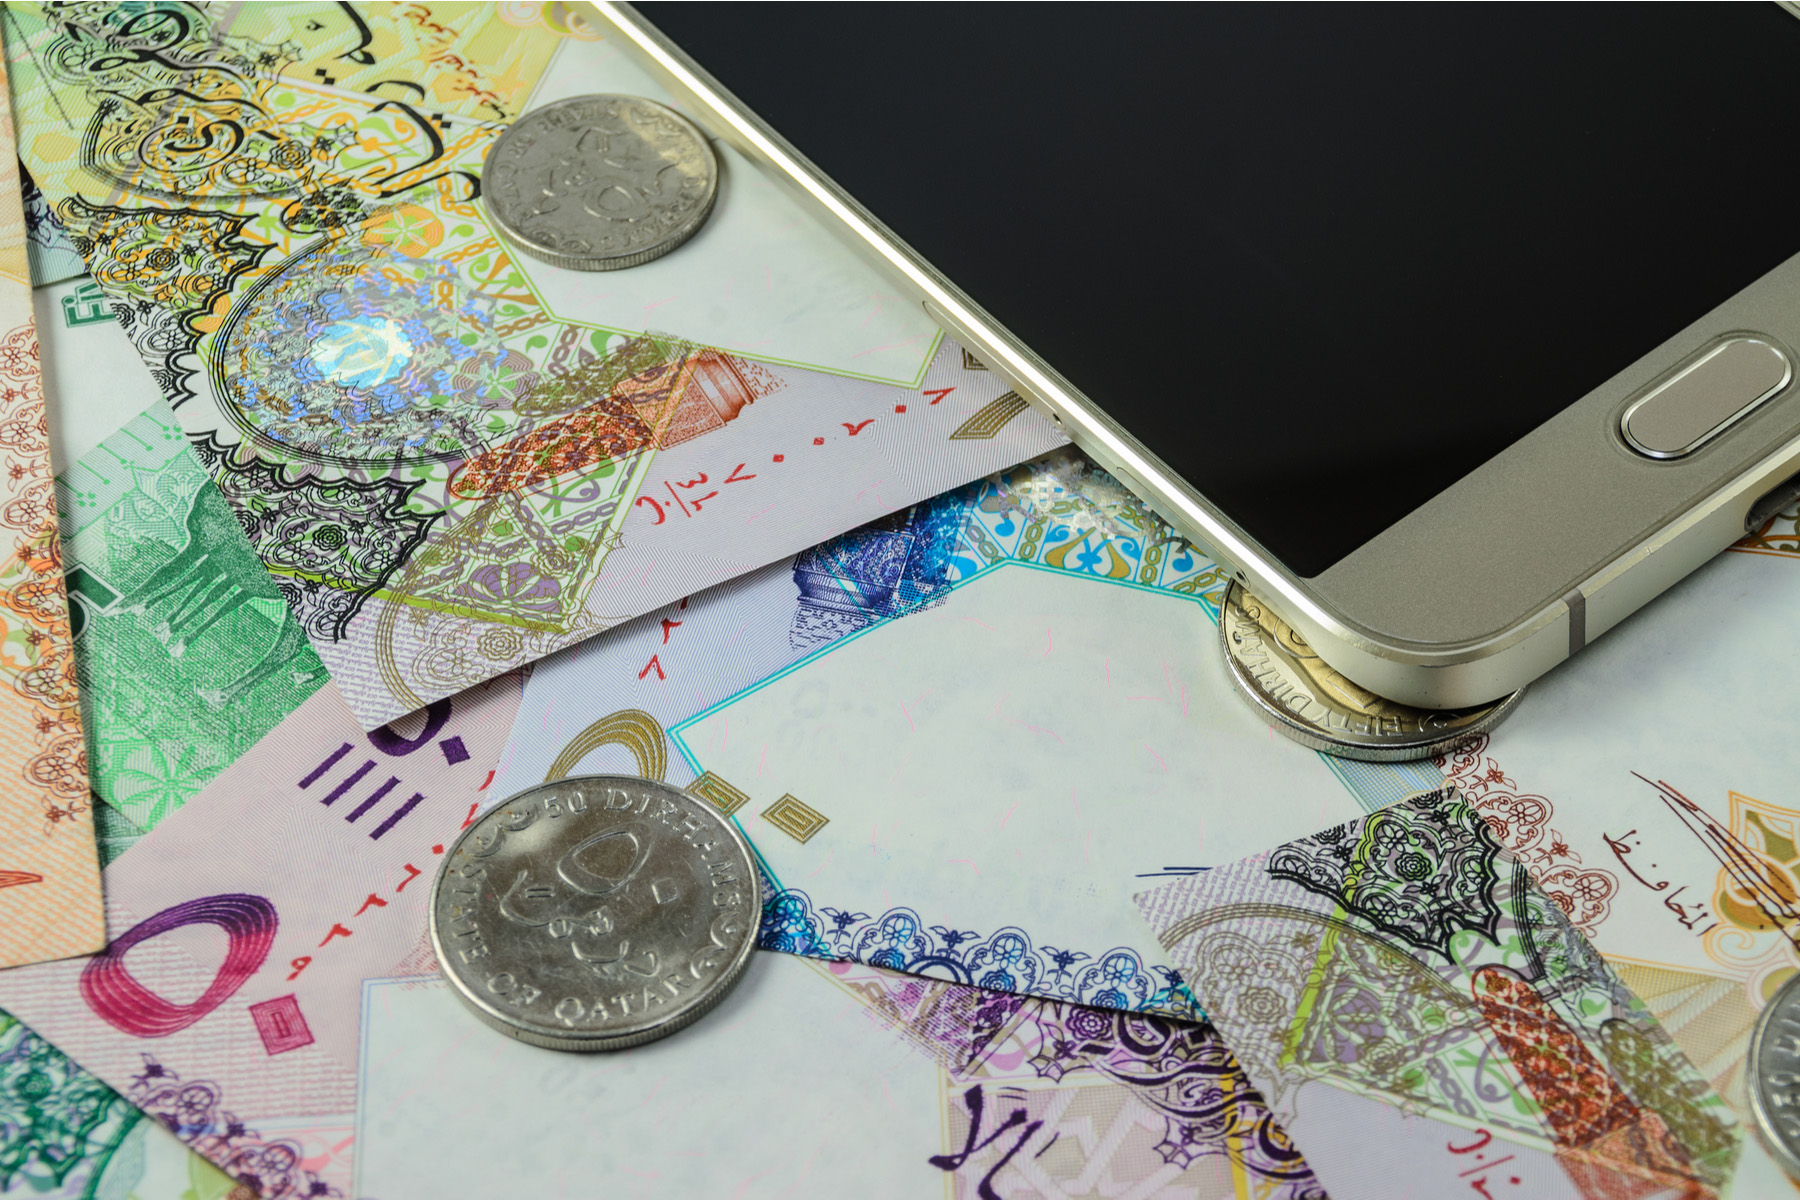 Qatari money and a mobile phone